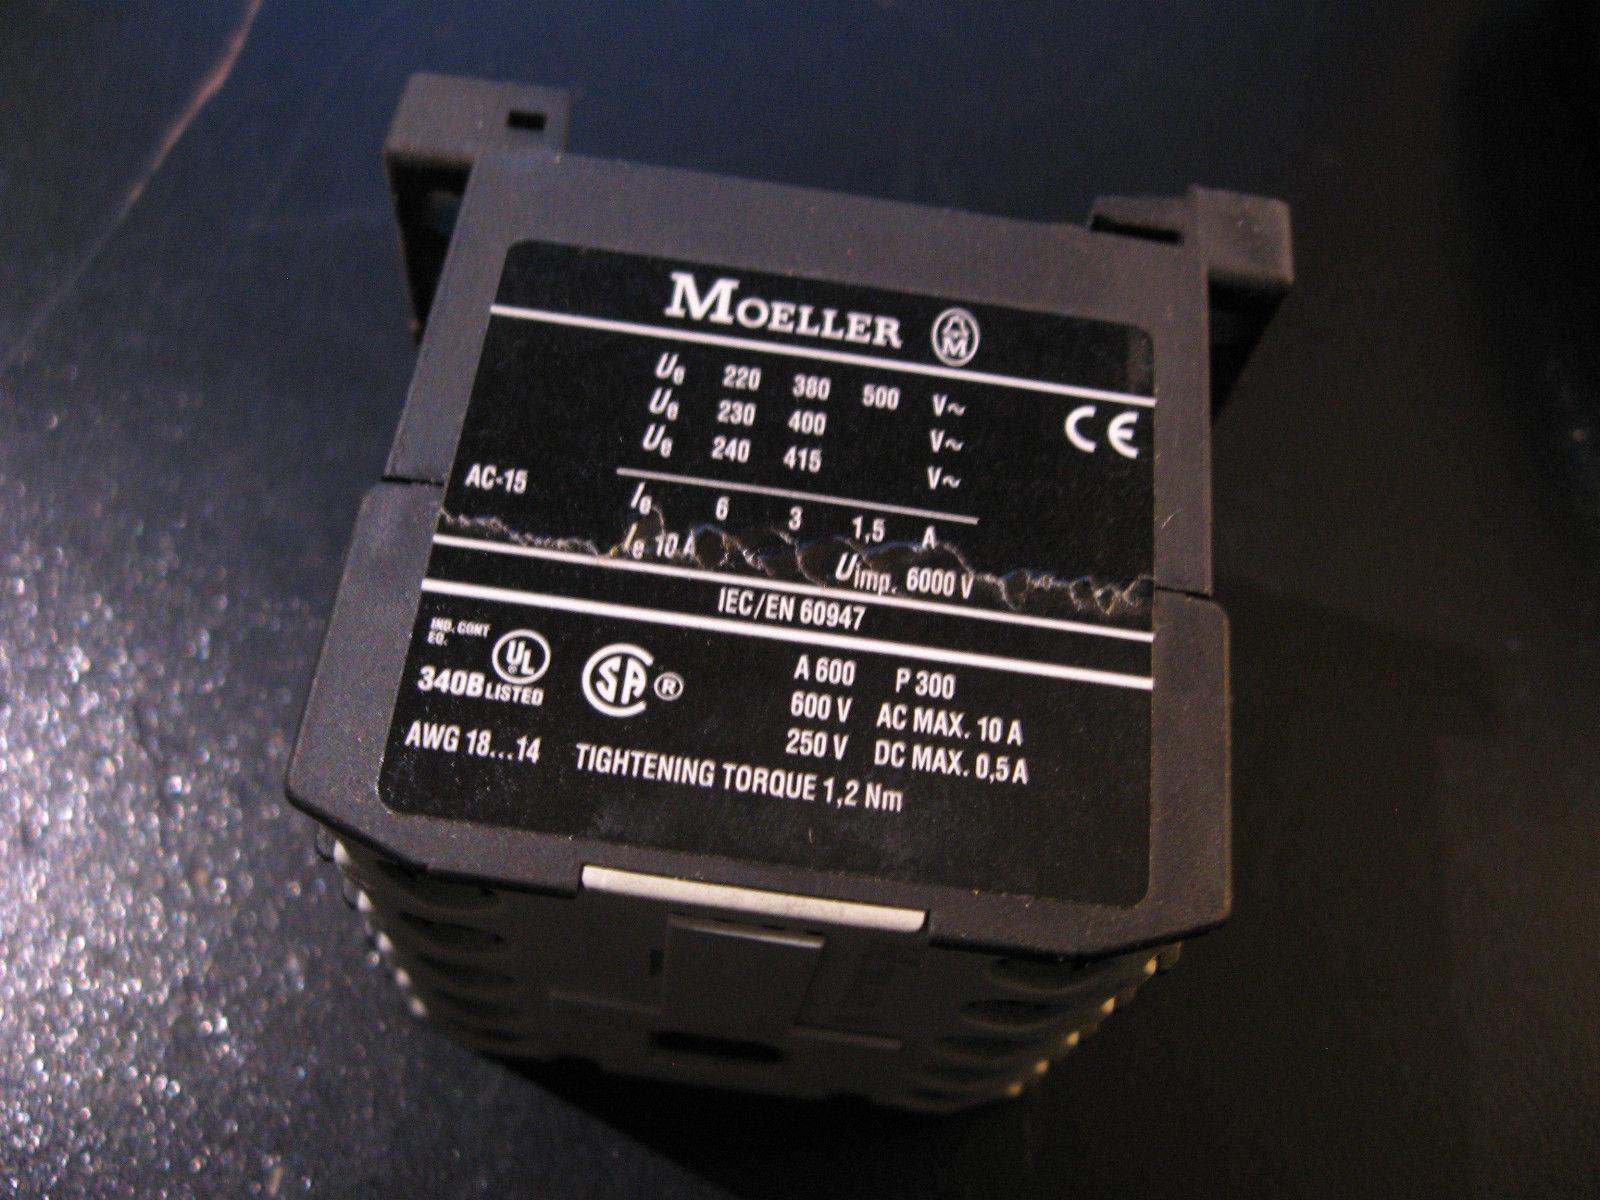 4KW 24Vac MOELLER-dilem-10 24VAC-CONTATTORE